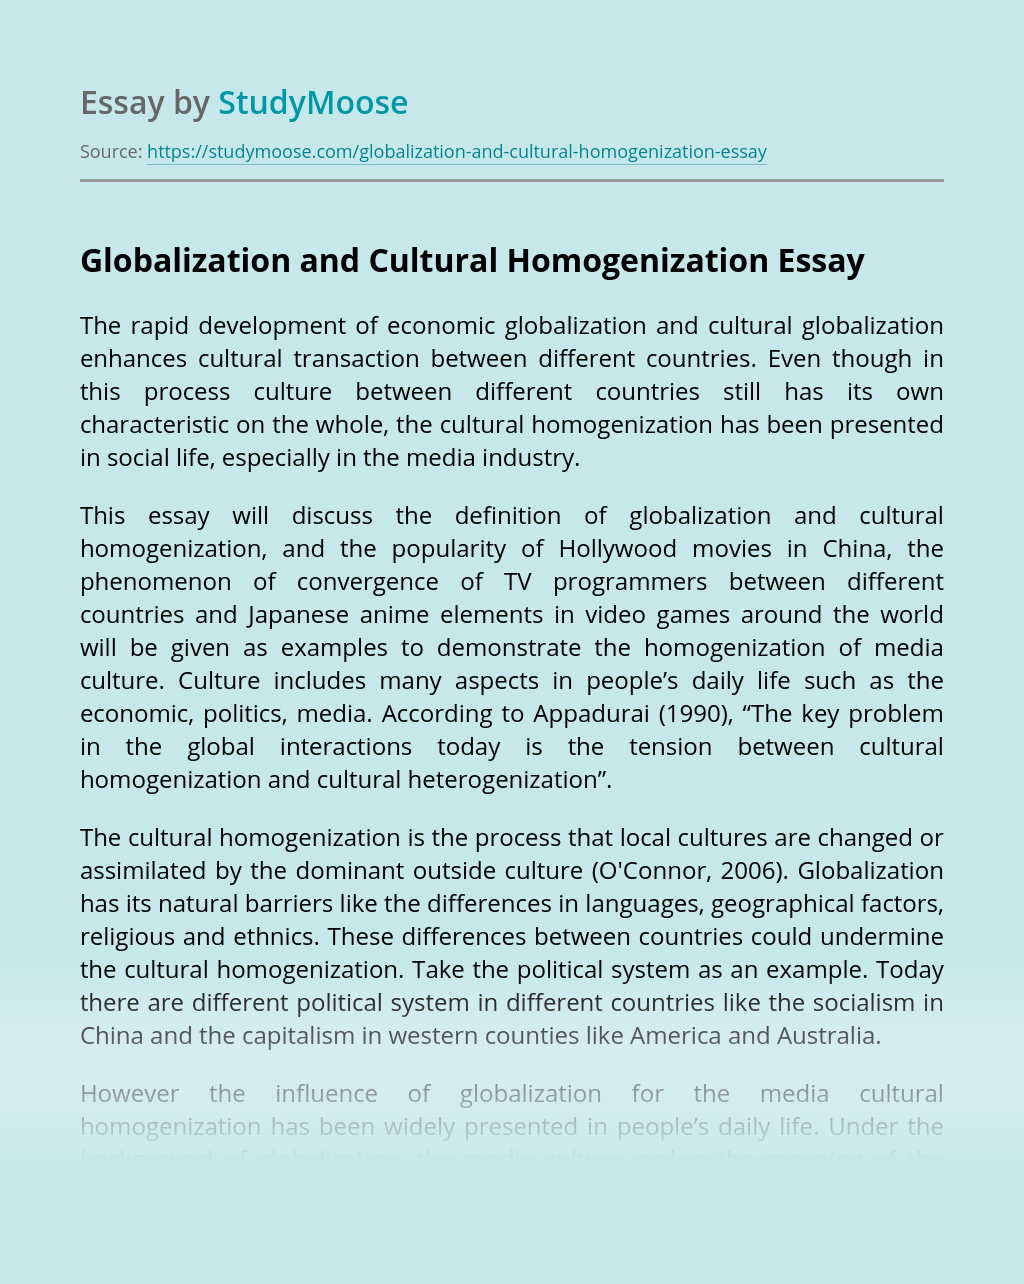 Globalization and Cultural Homogenization